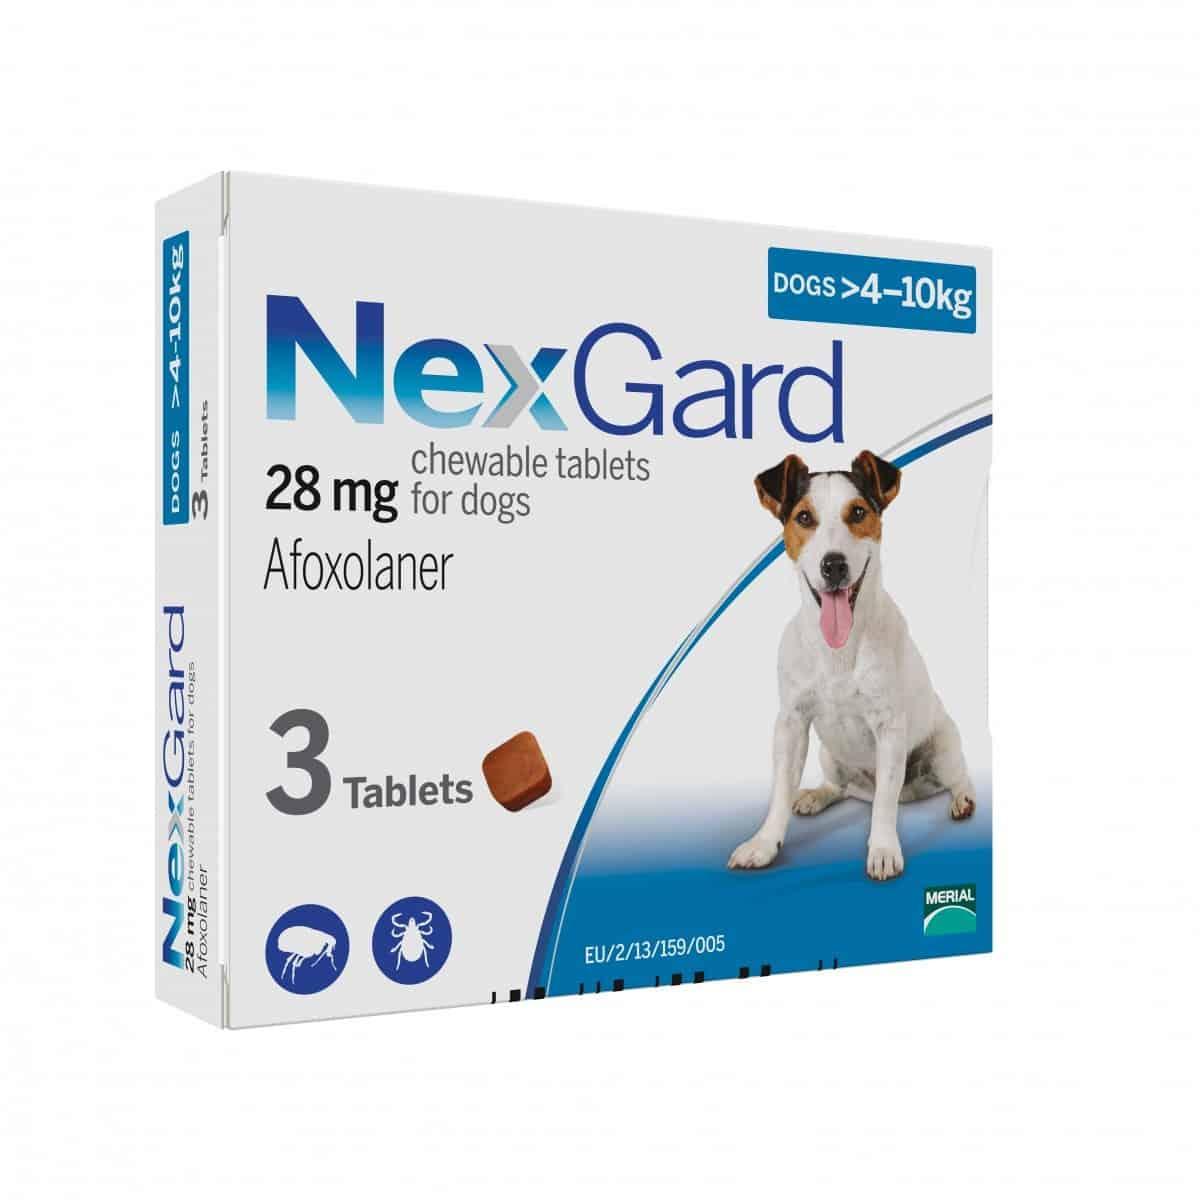 Nexgard - >4kg to 10kg